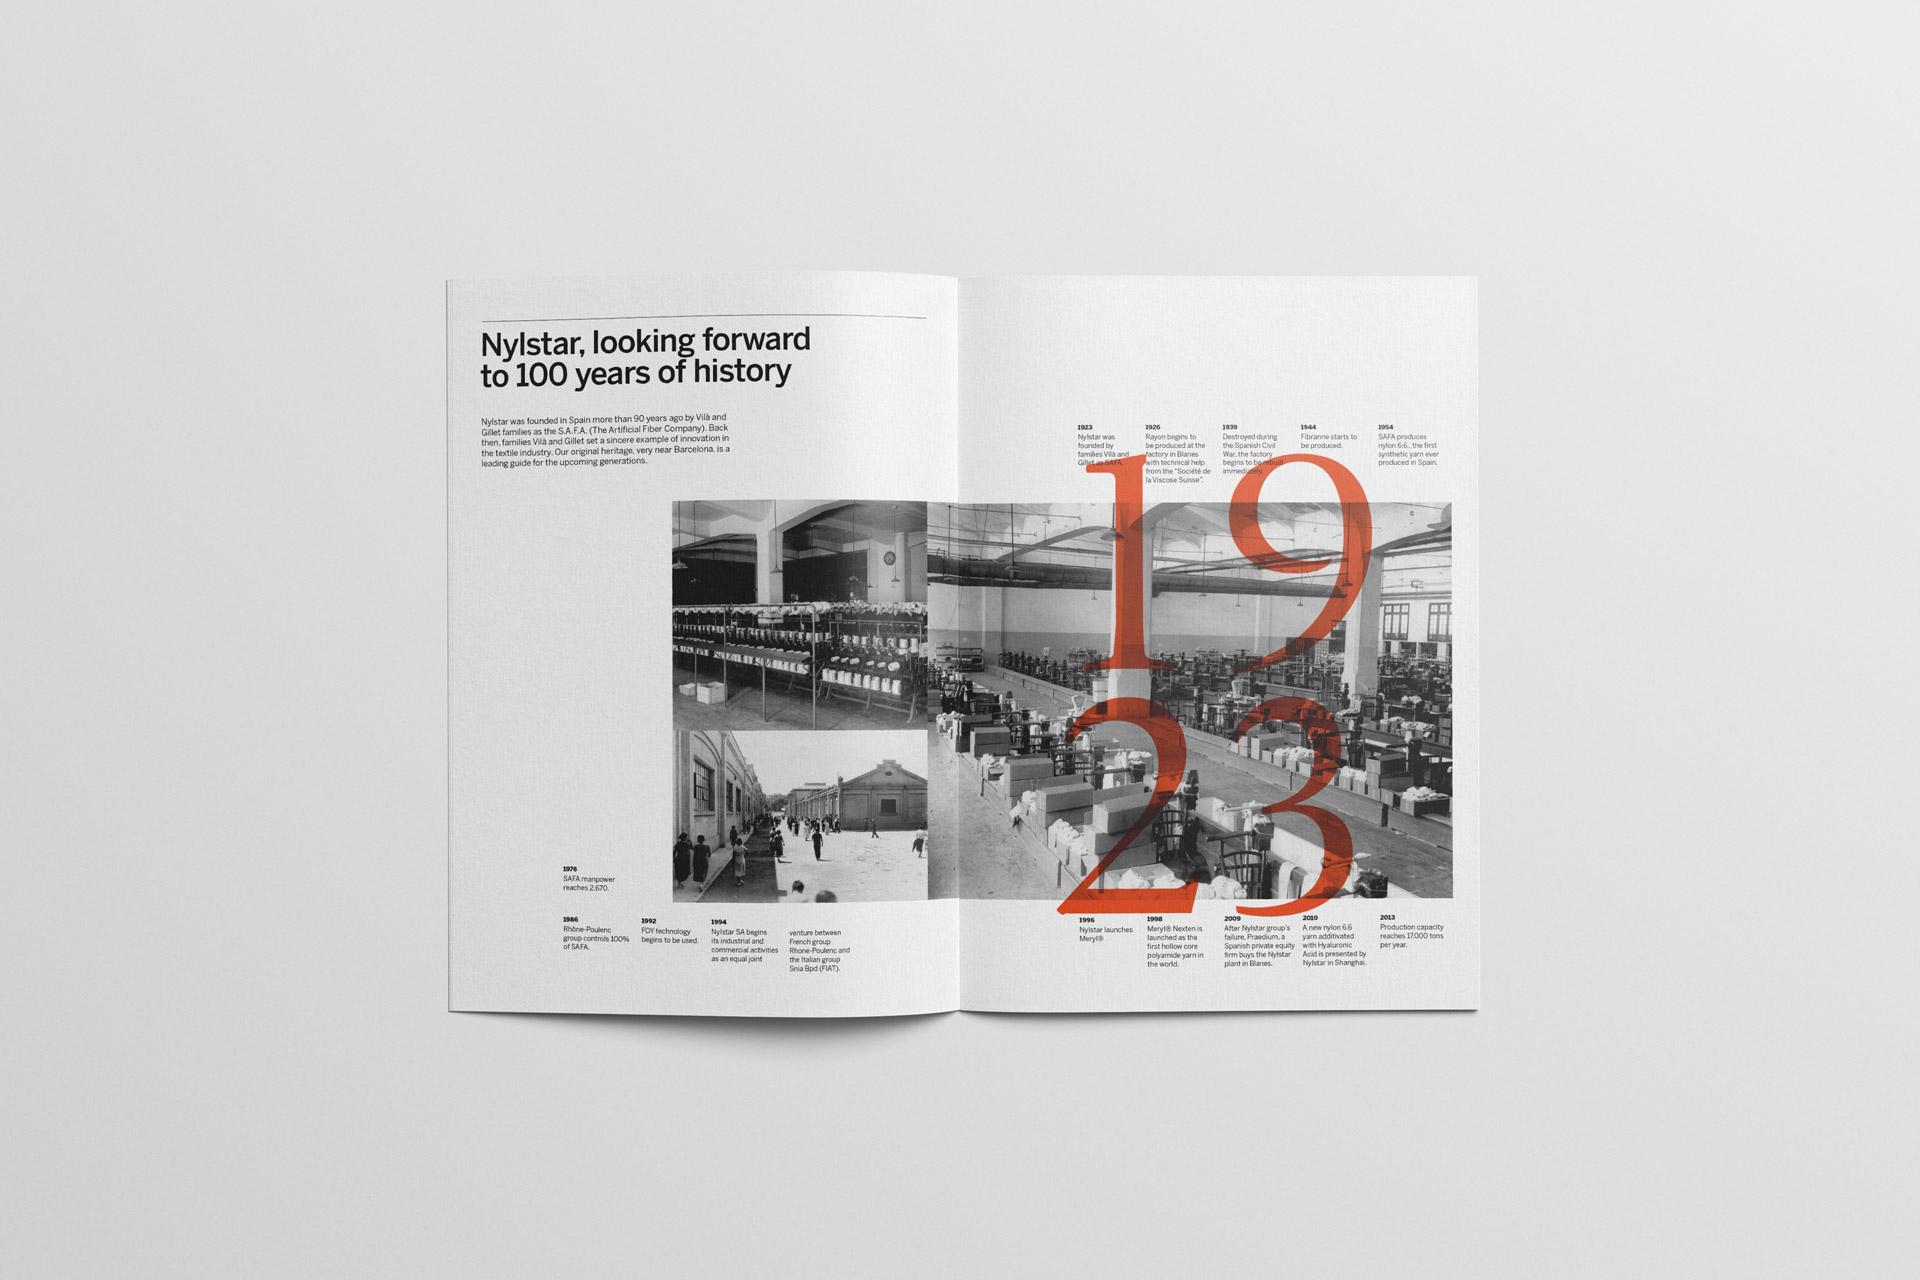 Dise o del informe anual para nylstar fase estudio de for Diseno grafico editorial